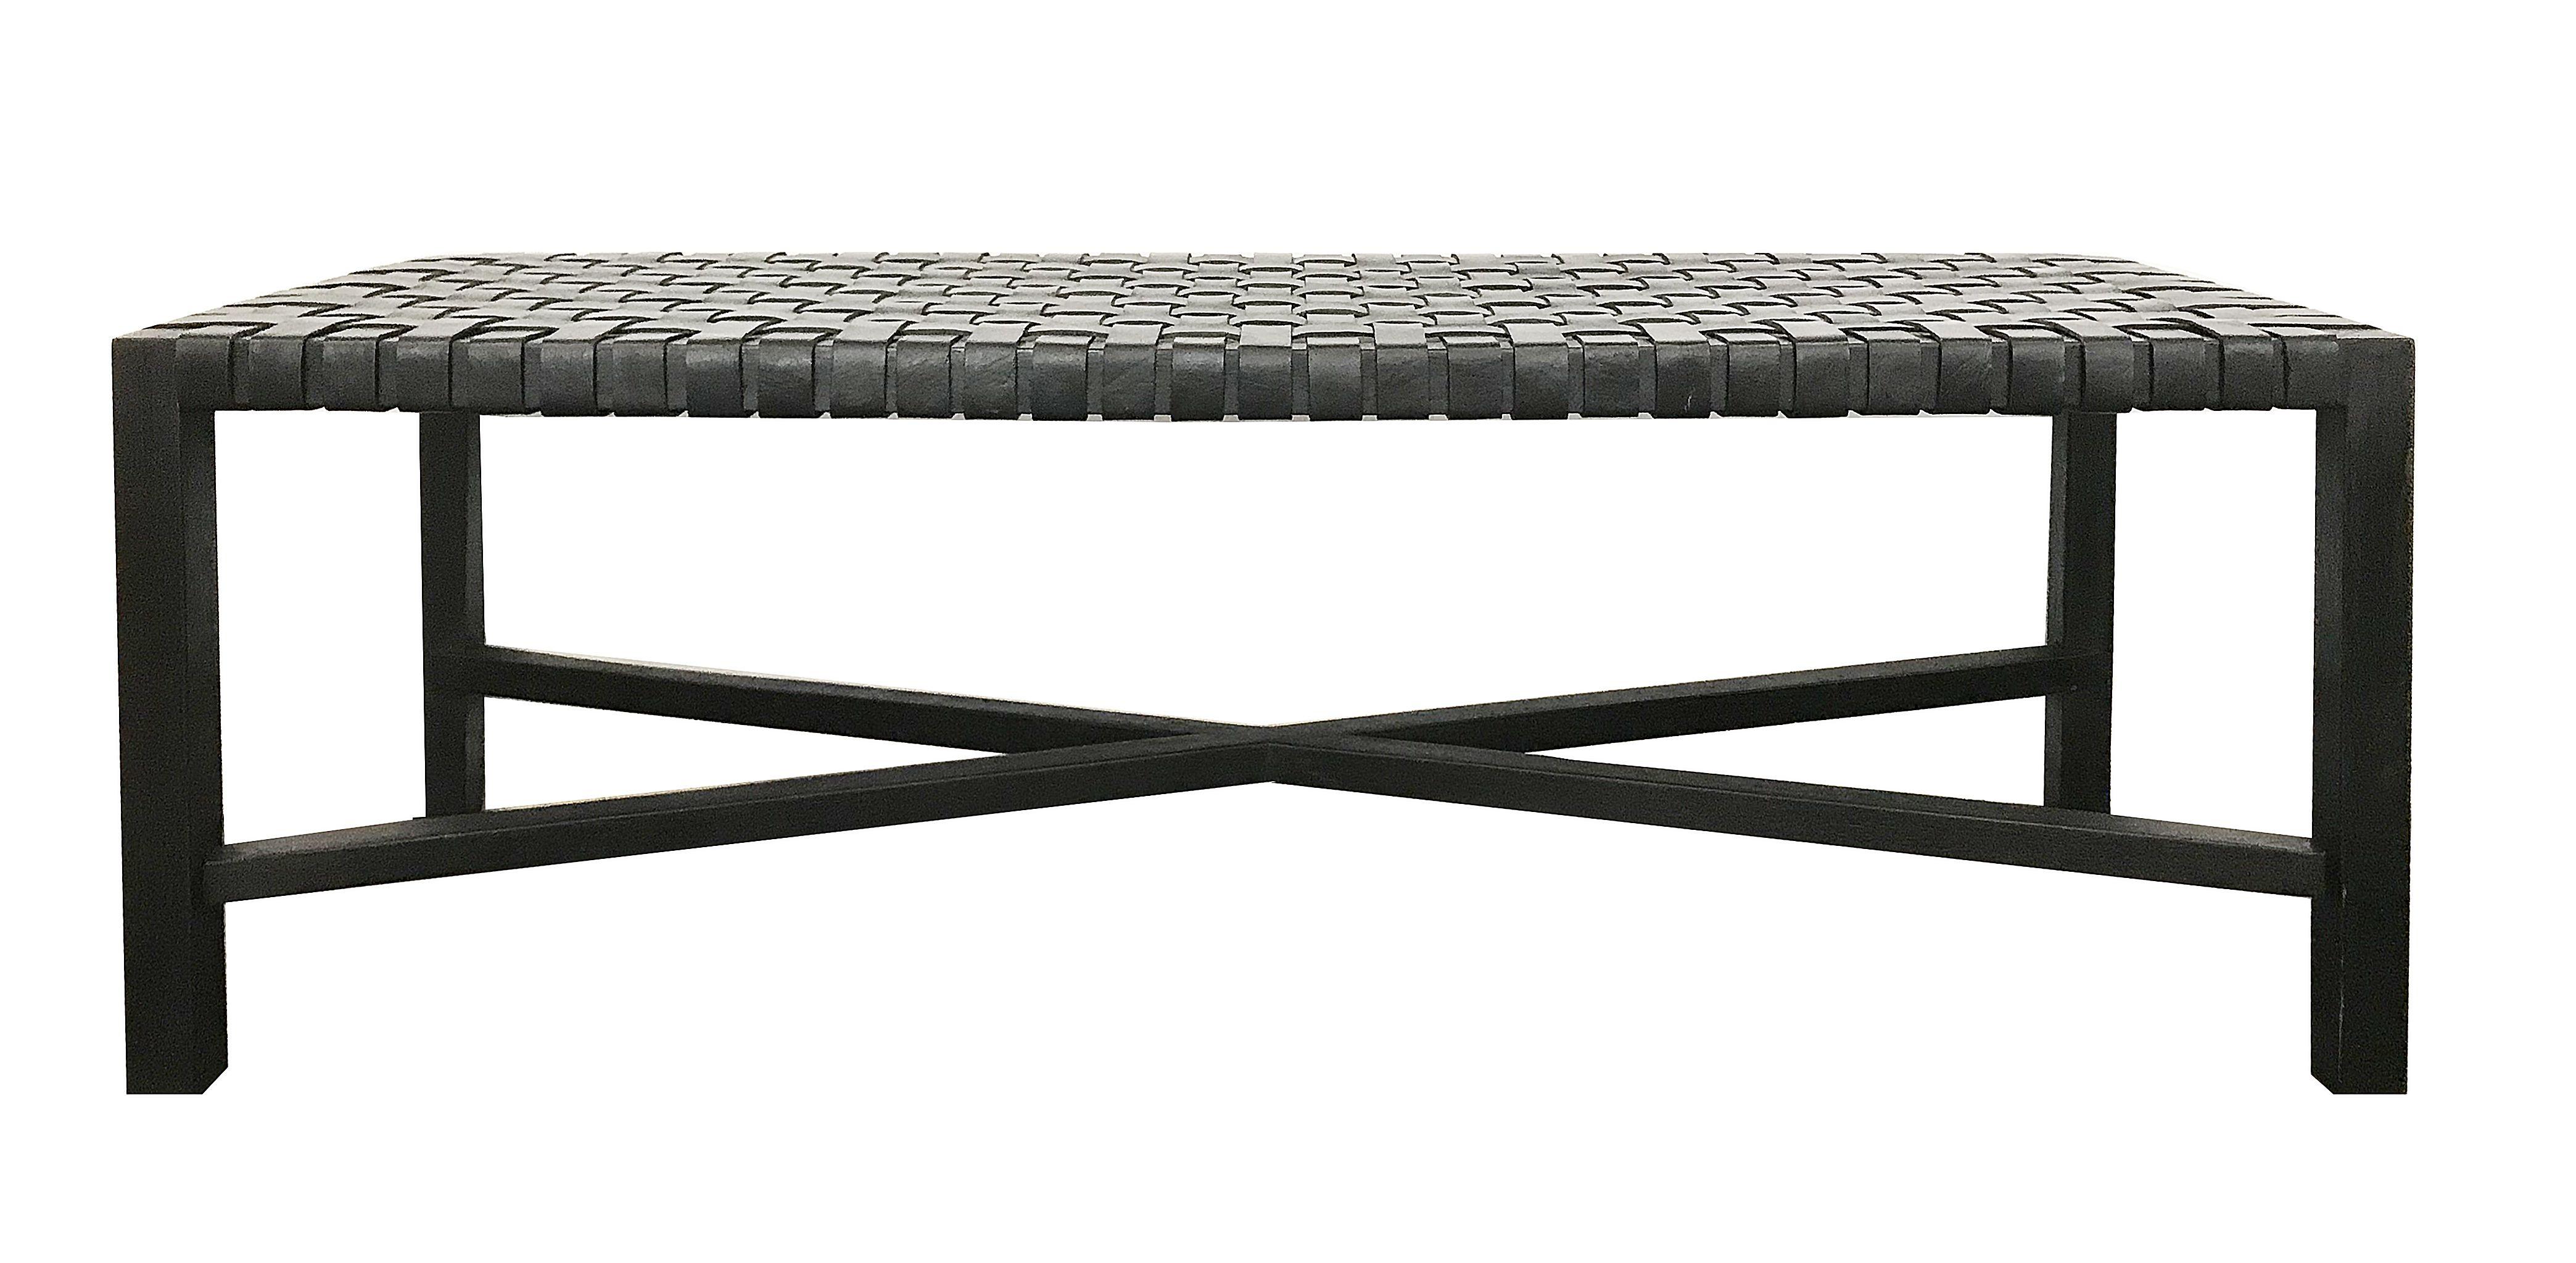 Peachy Alf Bench Black Mrd Home Olivers Rd In 2019 Bench Spiritservingveterans Wood Chair Design Ideas Spiritservingveteransorg